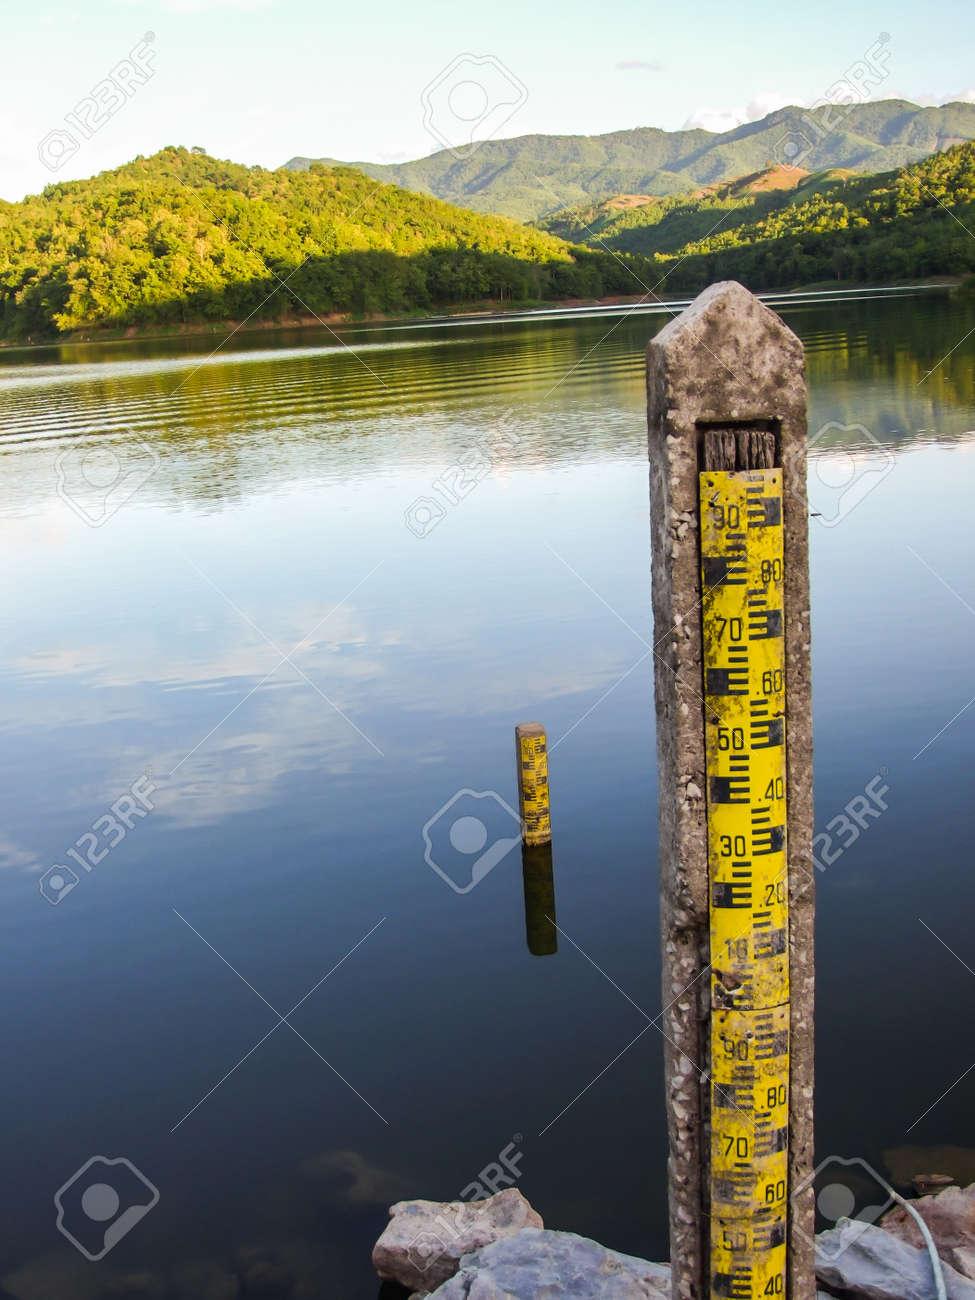 water level indicators at dam Stock Photo - 21849367